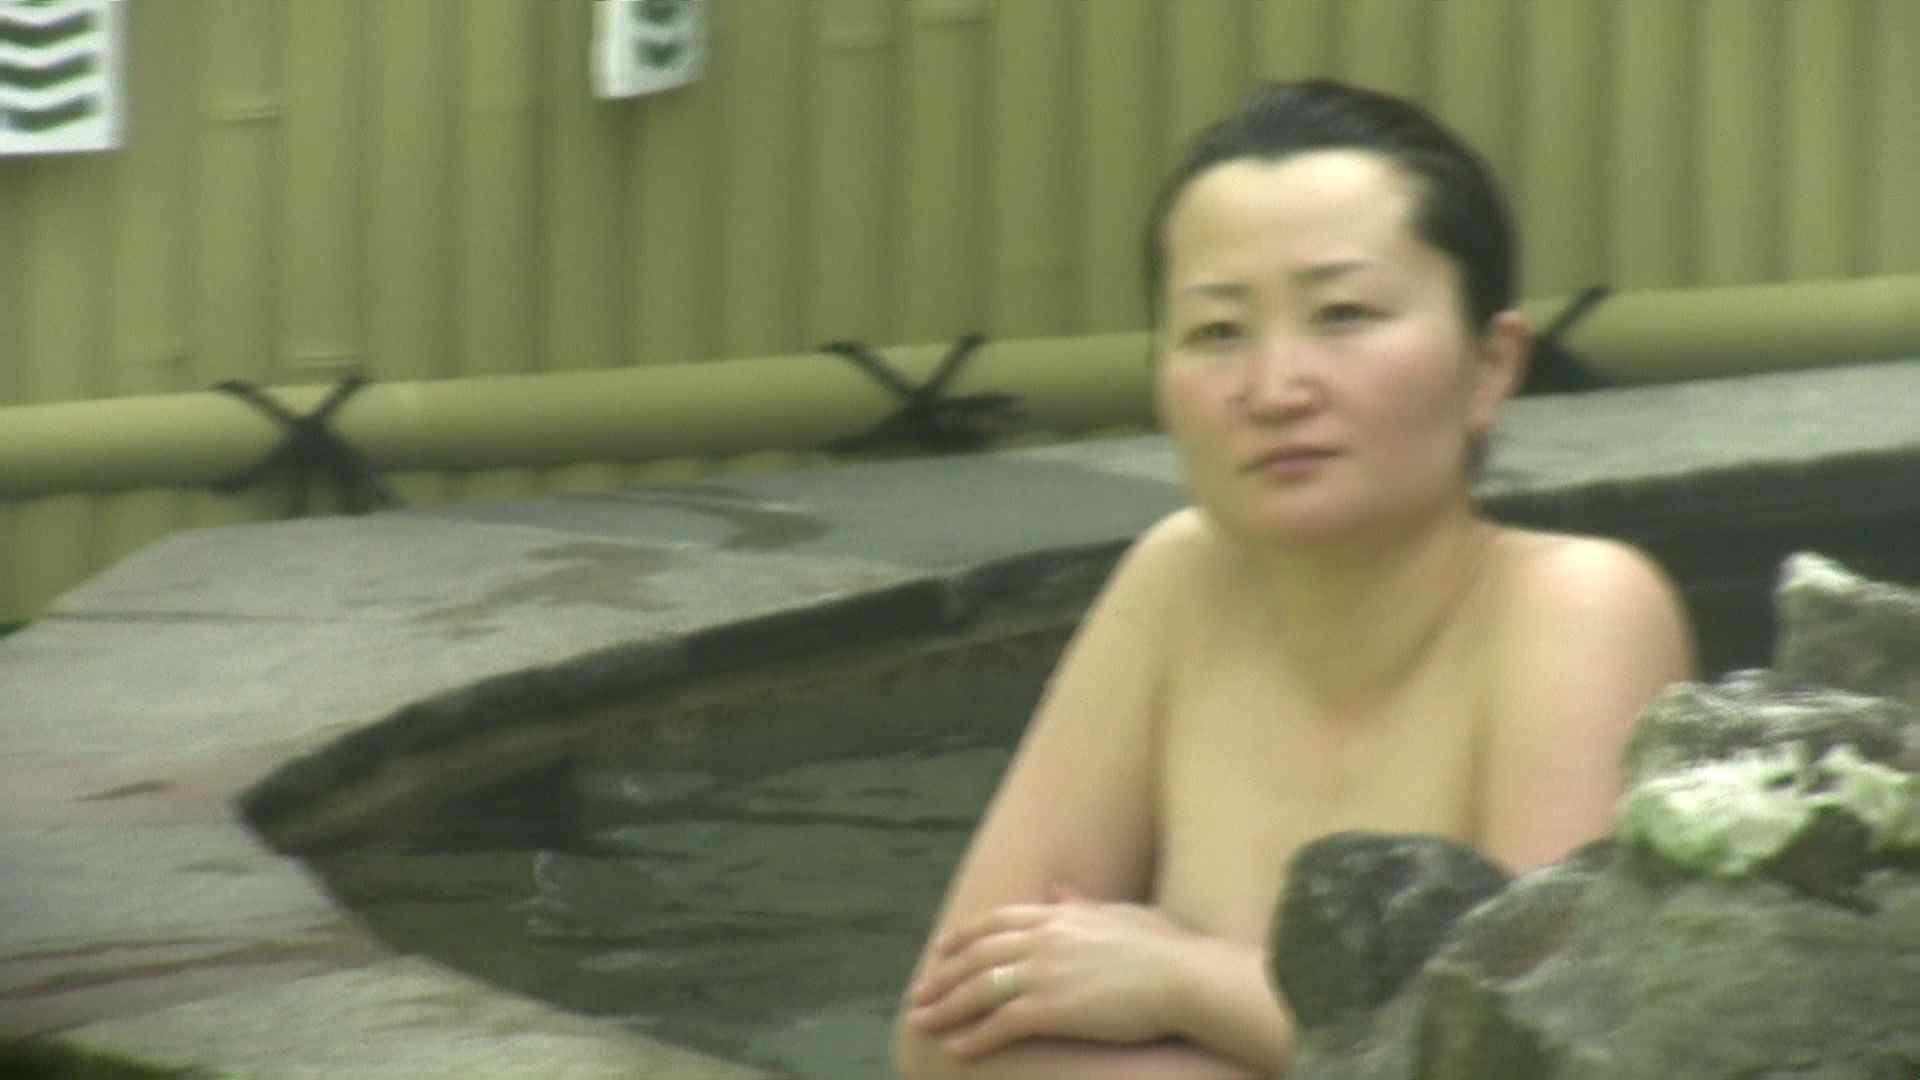 Aquaな露天風呂Vol.632 盗撮 | OLセックス  70画像 46